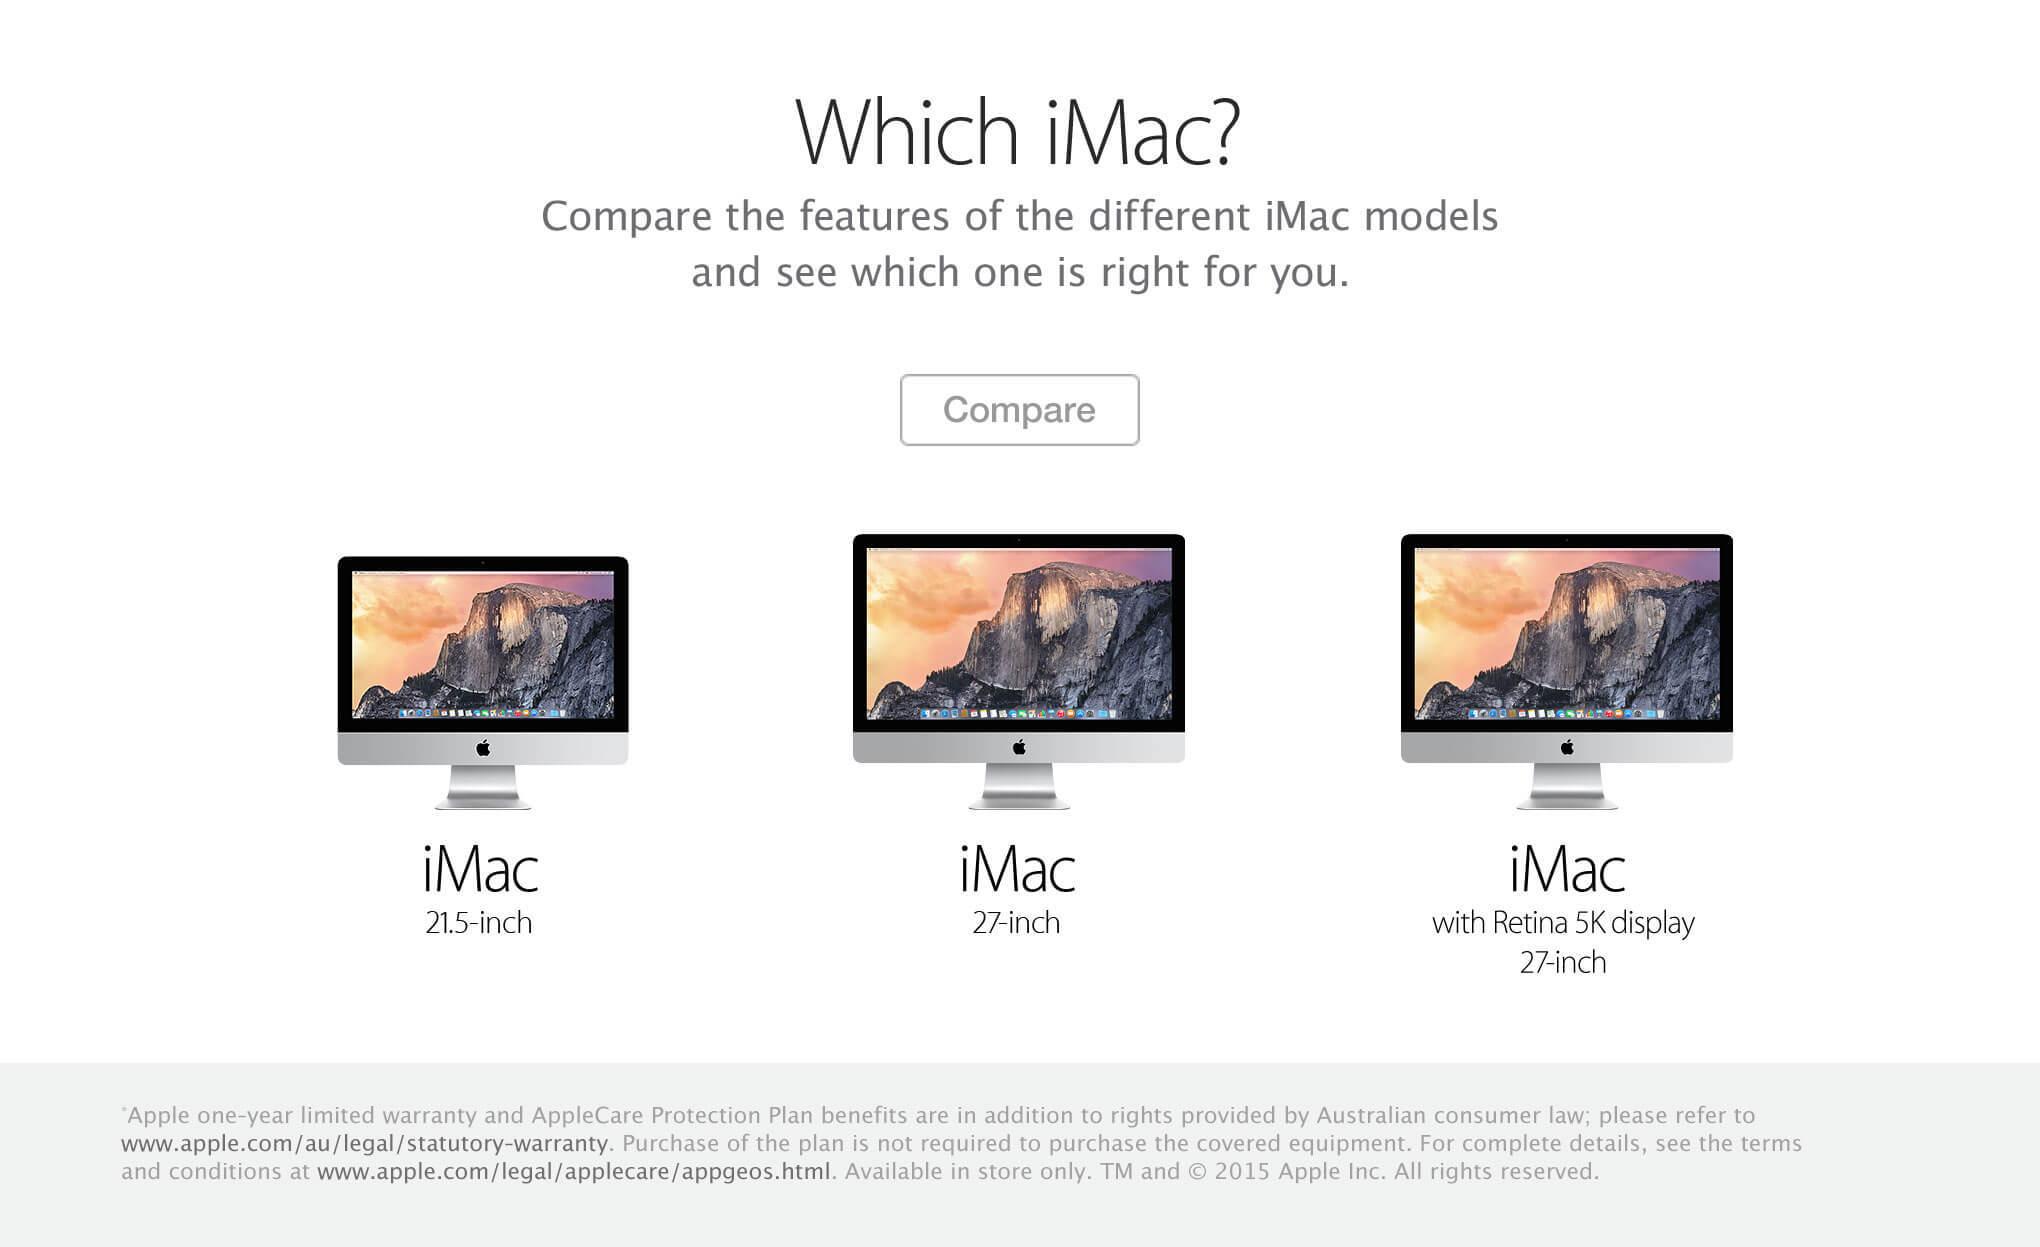 iMac 9